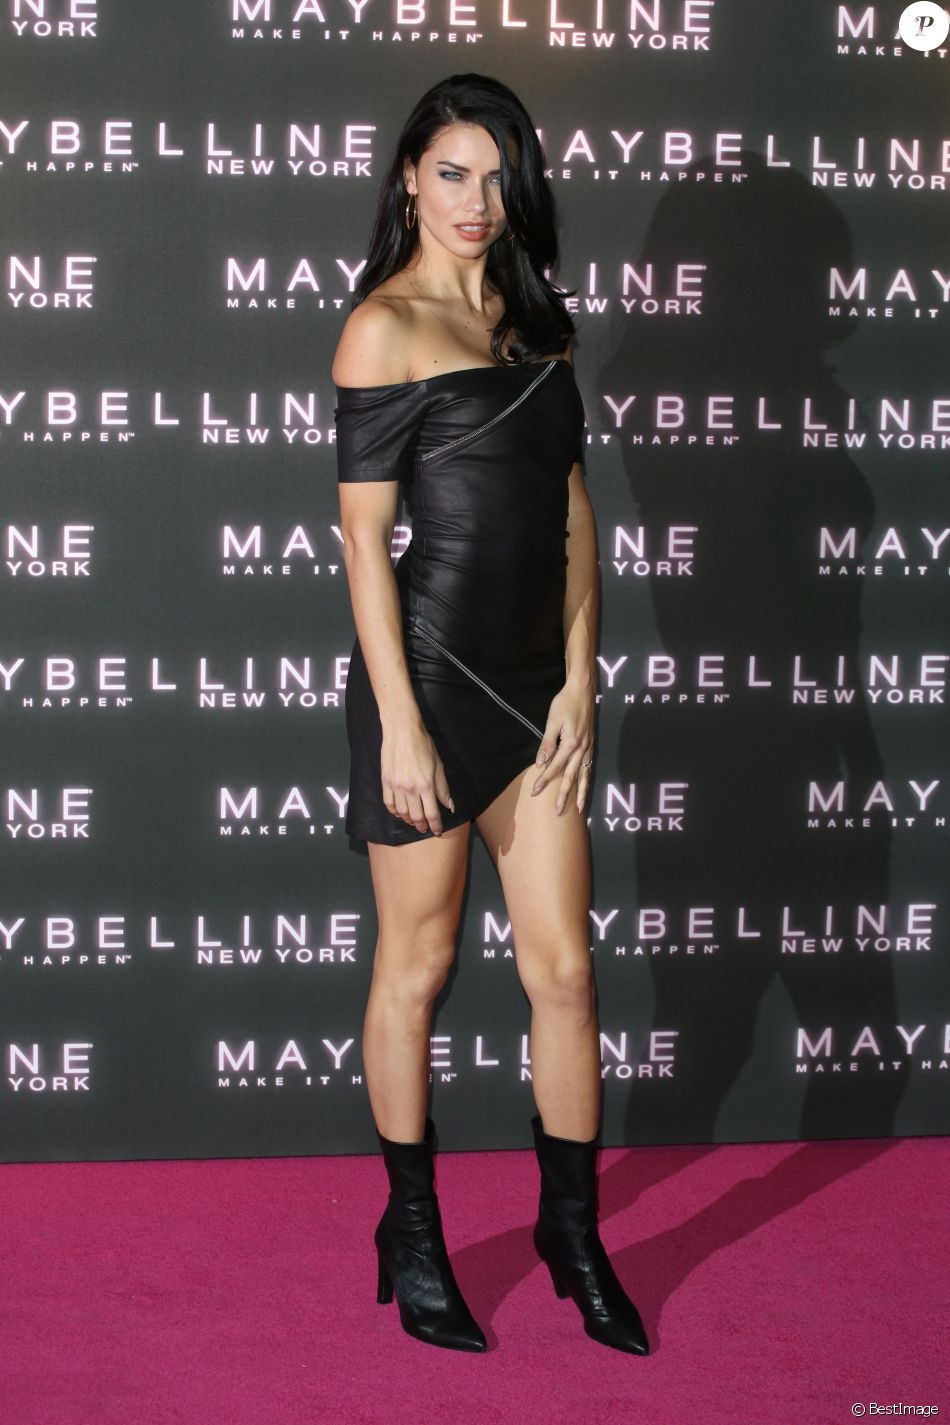 "Adriana Lima - Soirée Maybelline ""Bring on the Night"" au The Scotch of St. James à Londres le 18 février 2017."